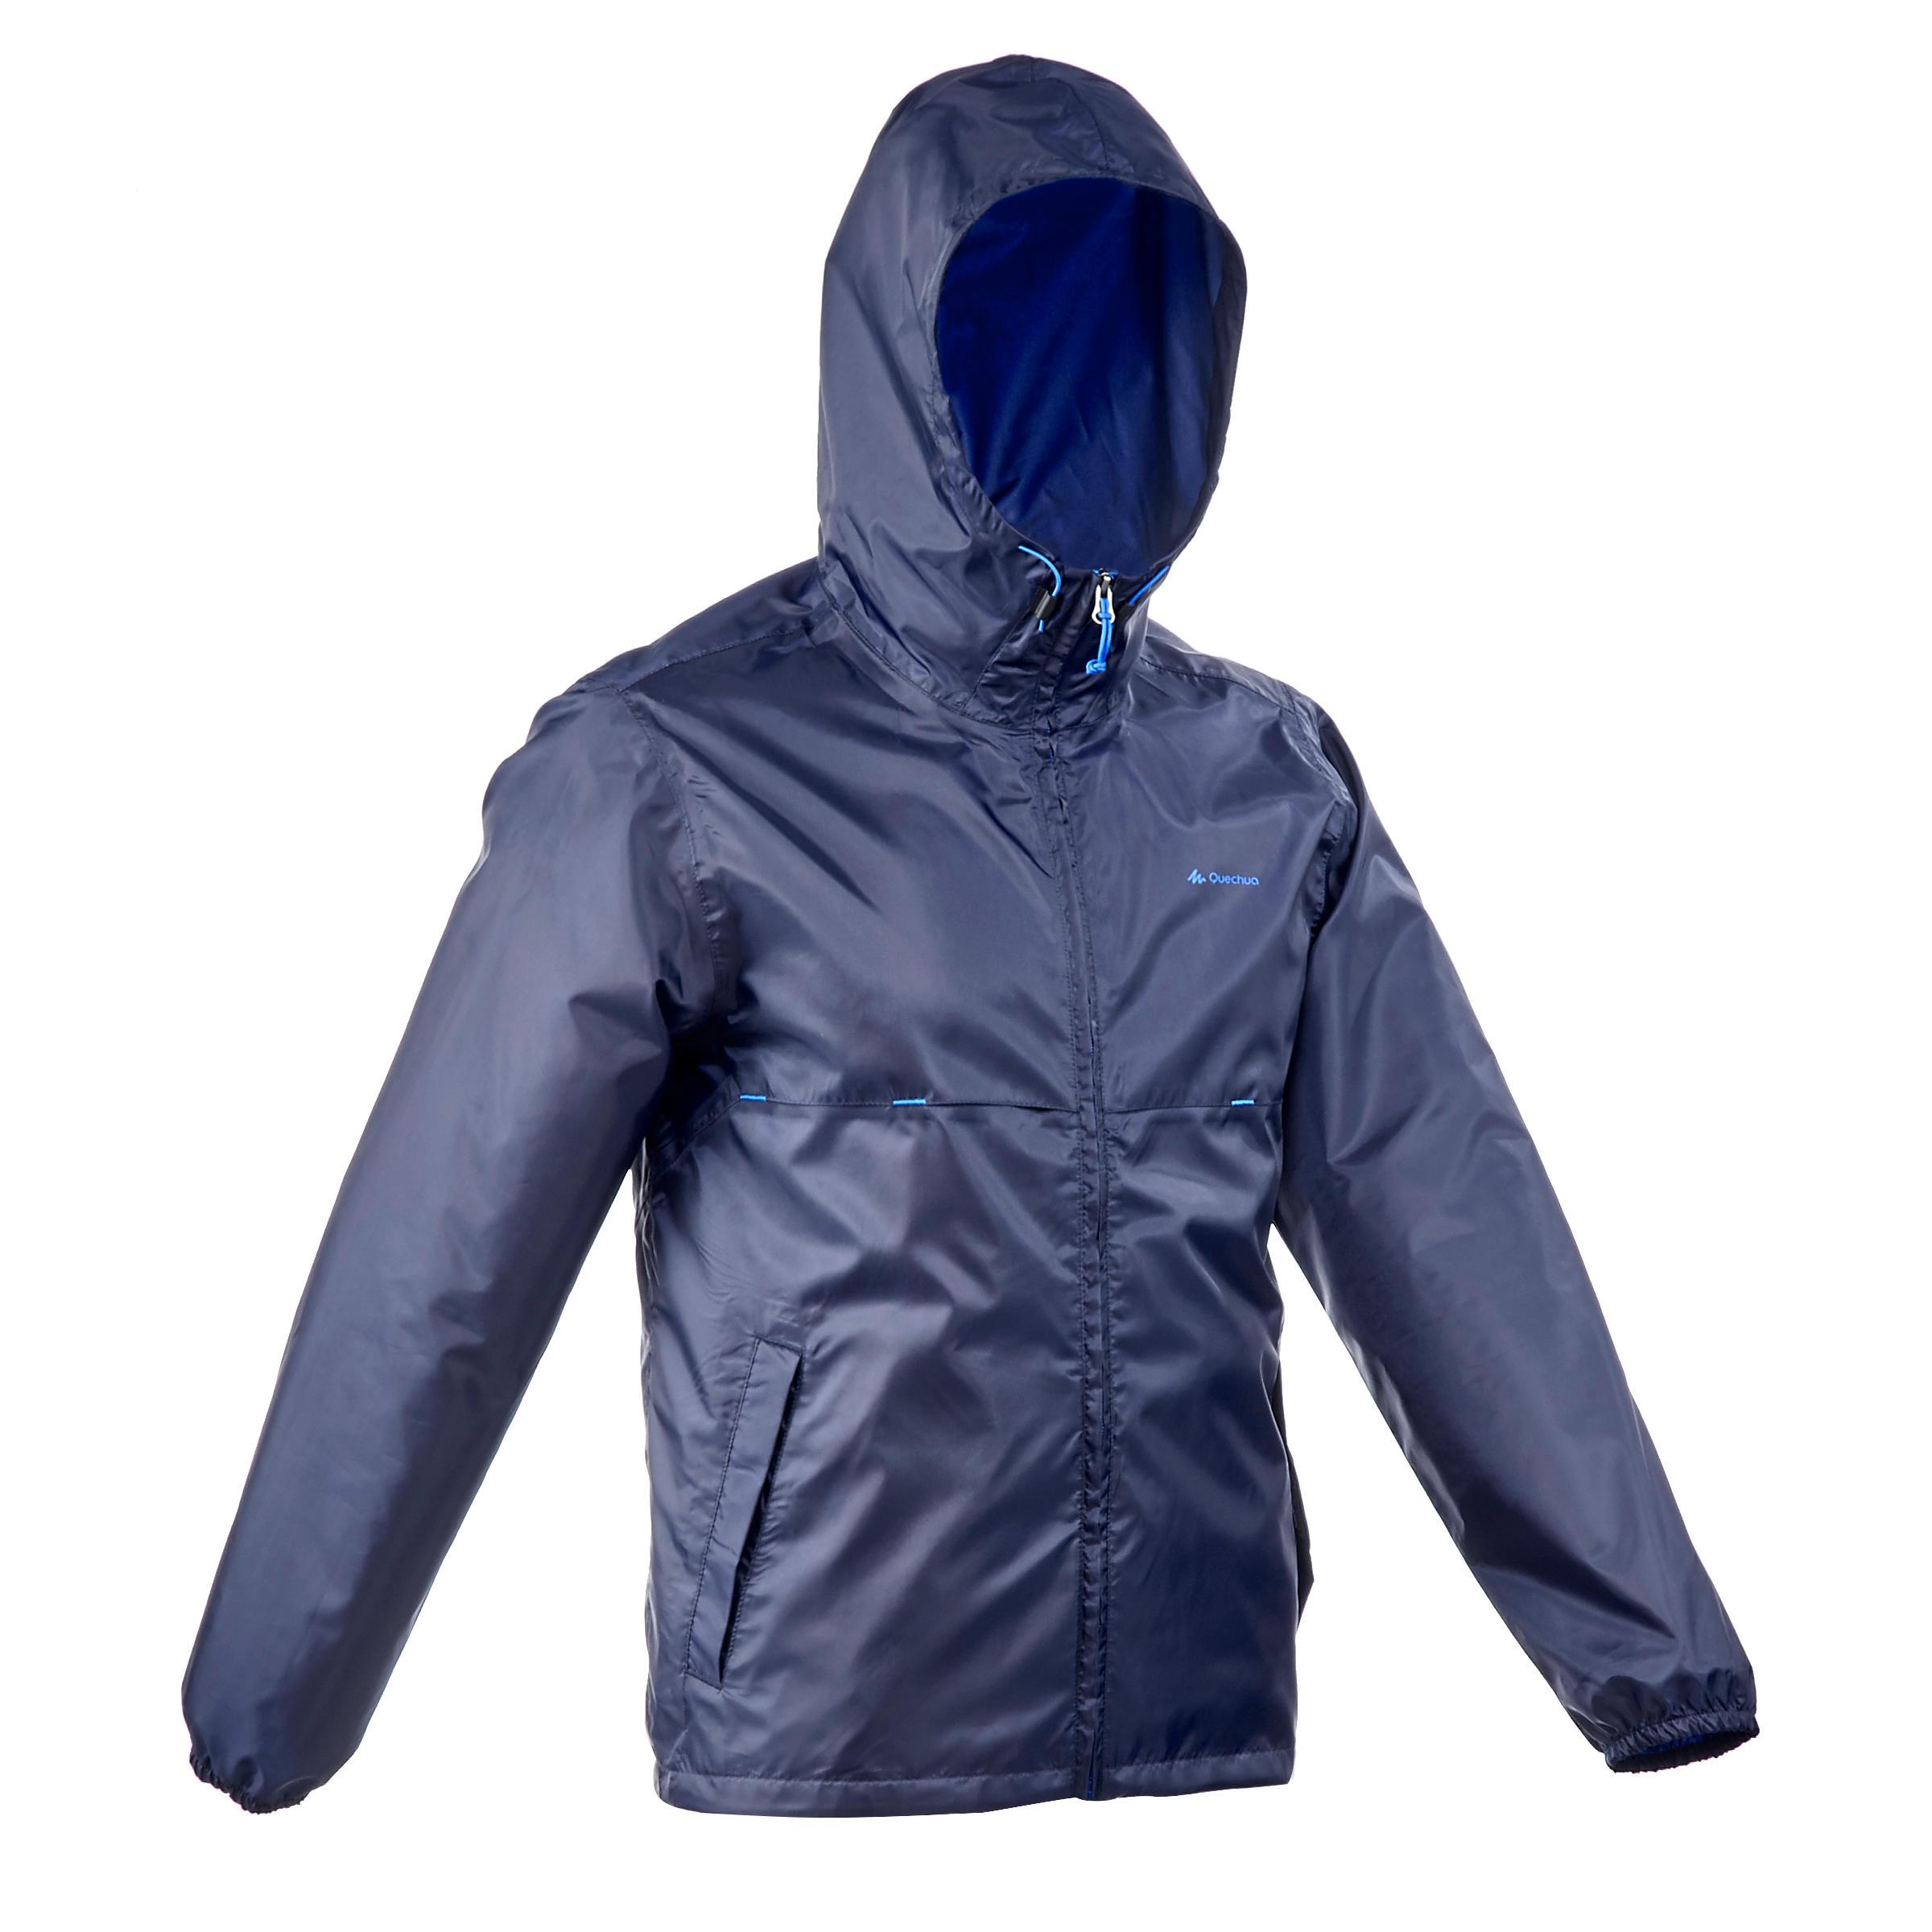 Jachetă Raincut NH100 Bărbați